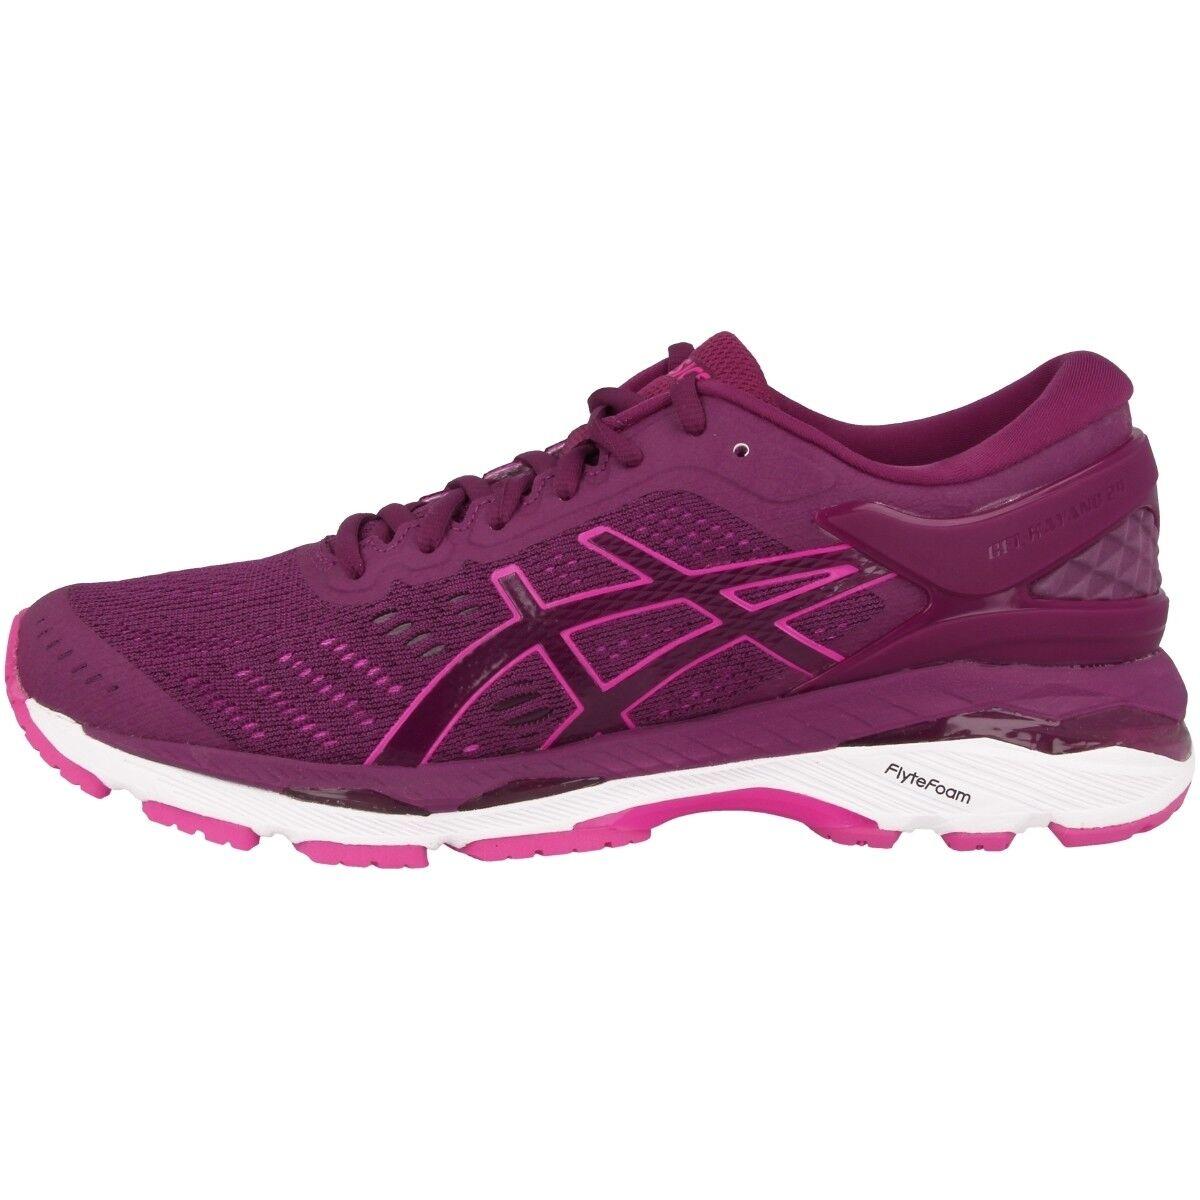 Asics Gel-Kayano 24 Donne shoes da  Corsa Prugna Fucsia Bianco T799N-3320  save up to 70%